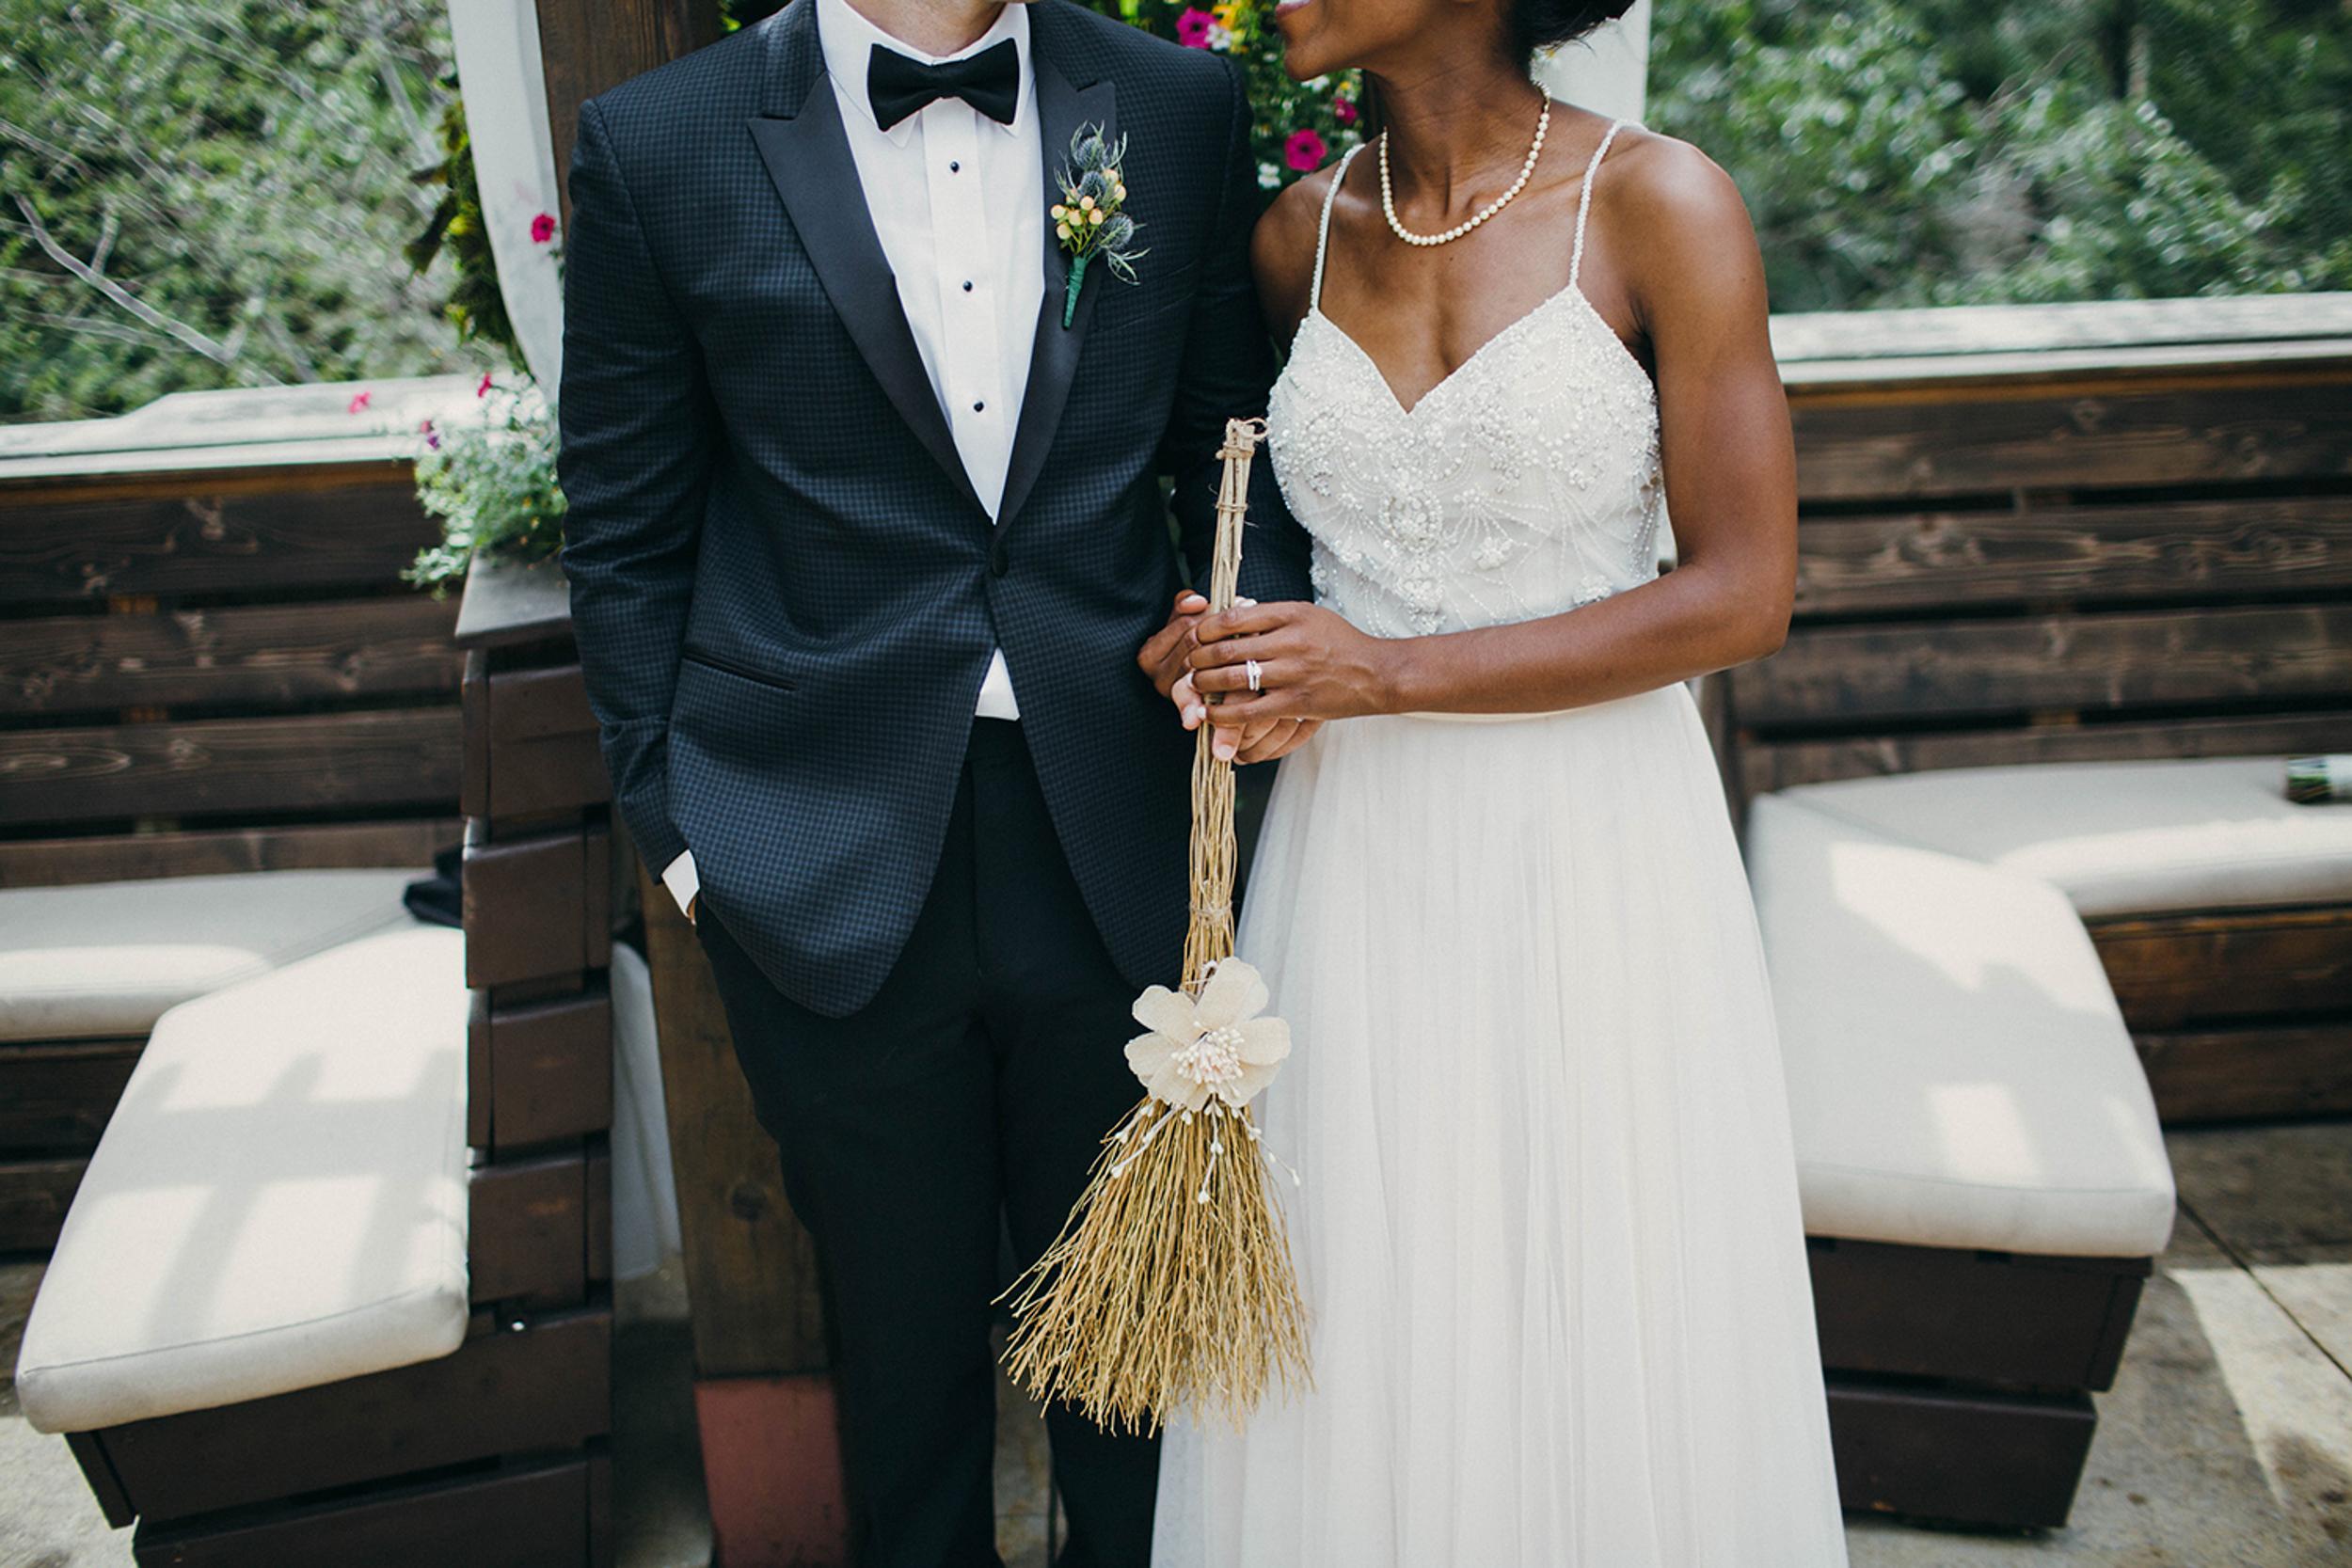 chicago.wedding.urban.intimate.zed451.lake.milton olive park-61.jpg